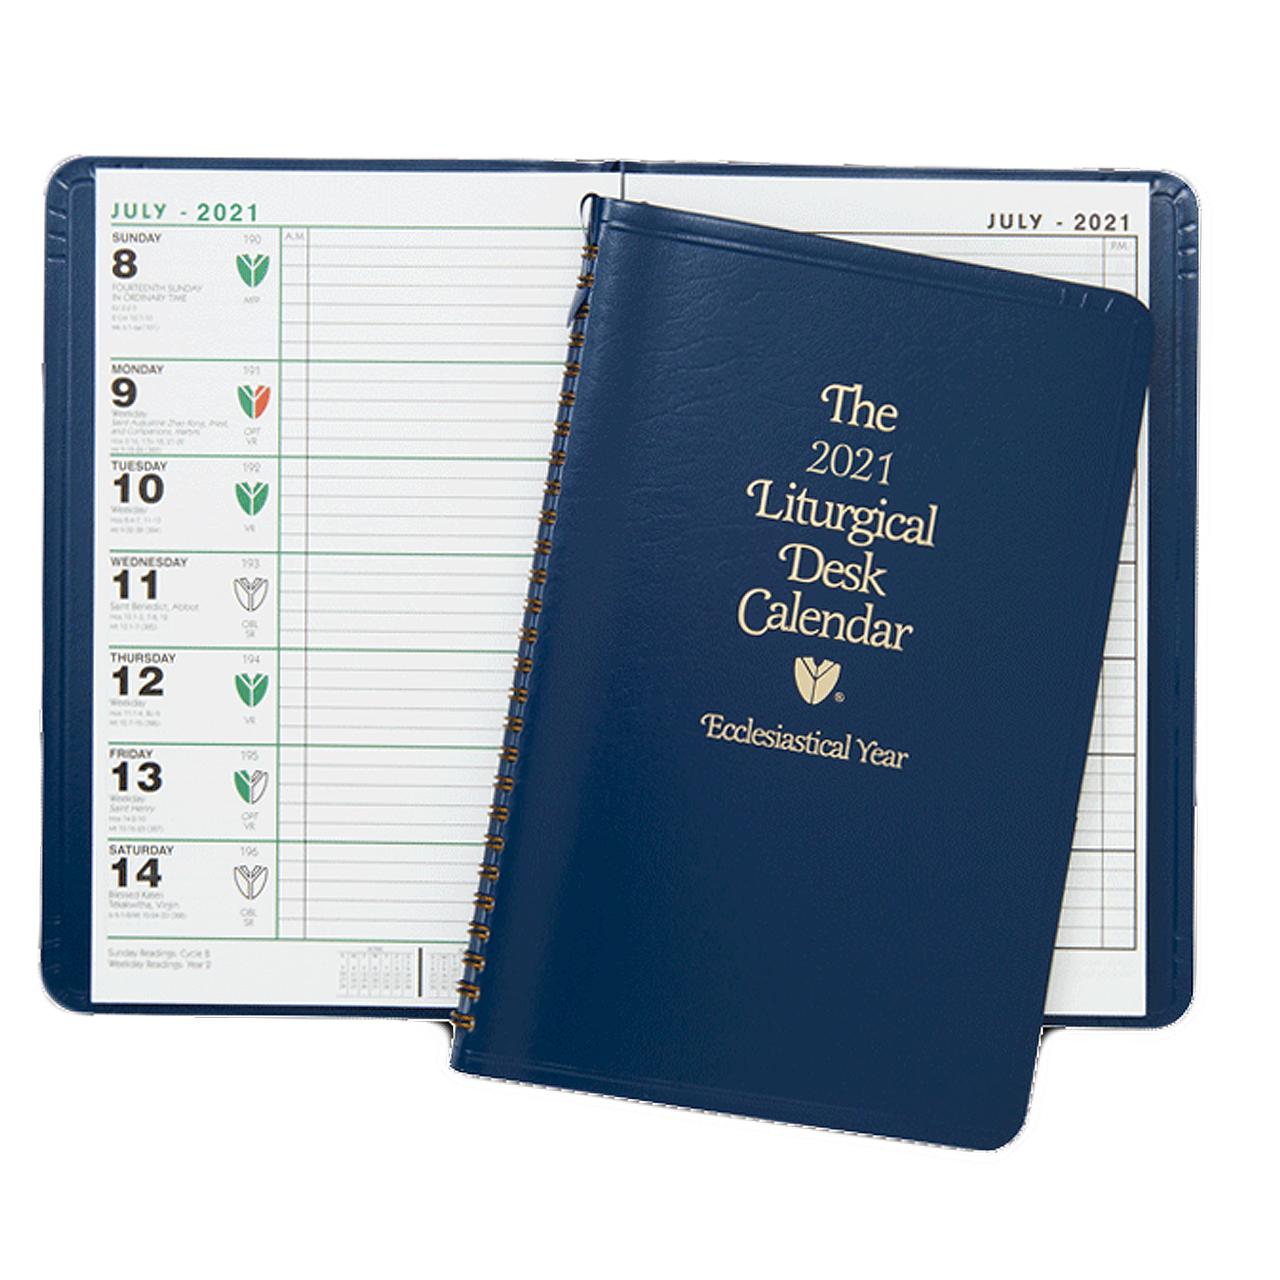 Liturgical Desk Calendar 2021 2021 Liturgical Desk Calendar   Spiral Bound   Flex Cover   9 3/4